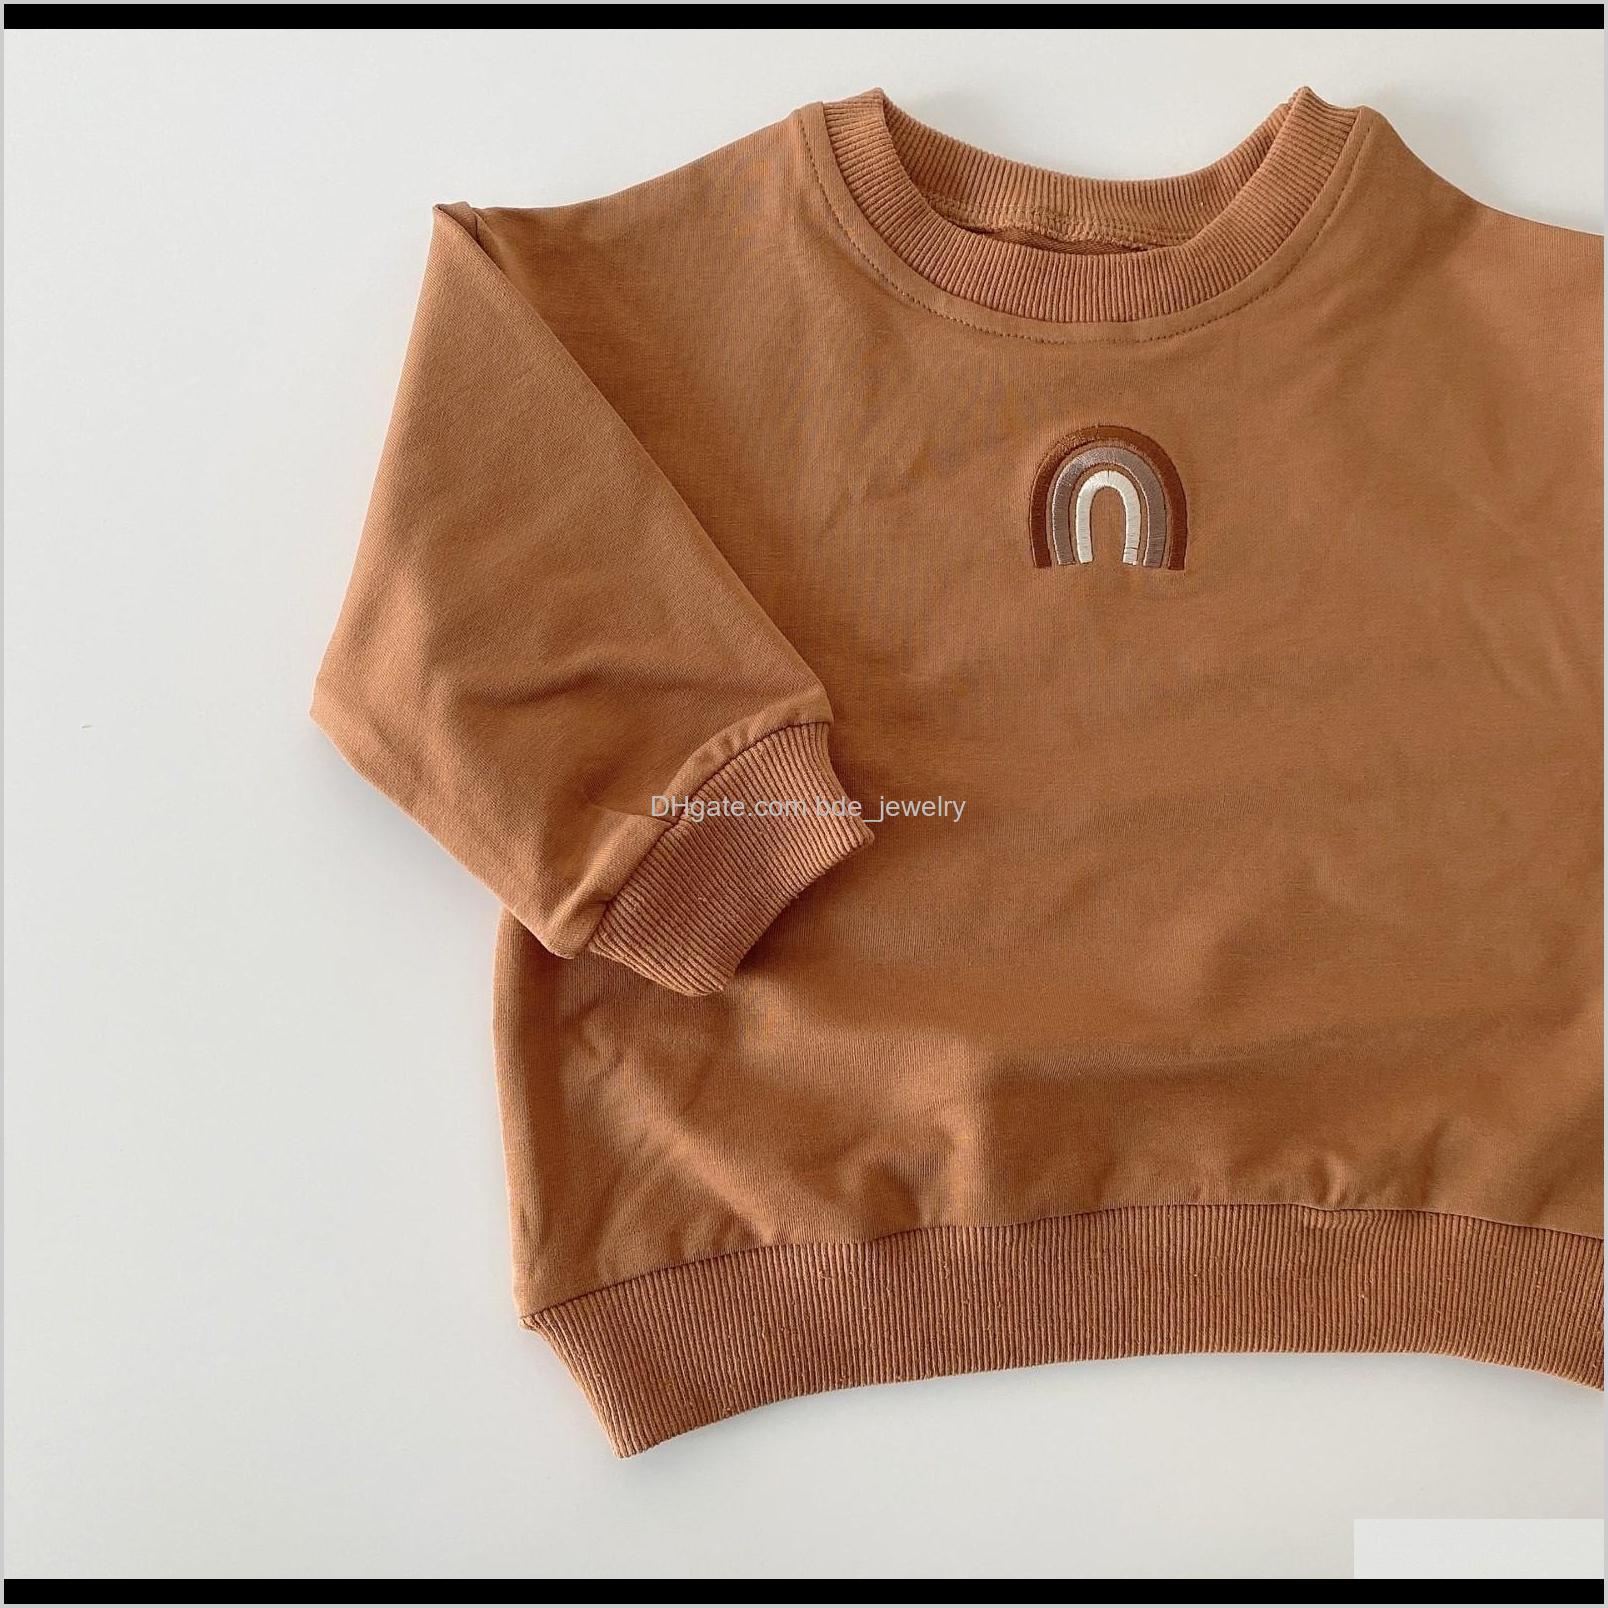 autumn toddler baby girls boys rainbow sweatshirts tops kids long sleeve rainbow t-shirt sweatshirt baby clothes outfits 201222